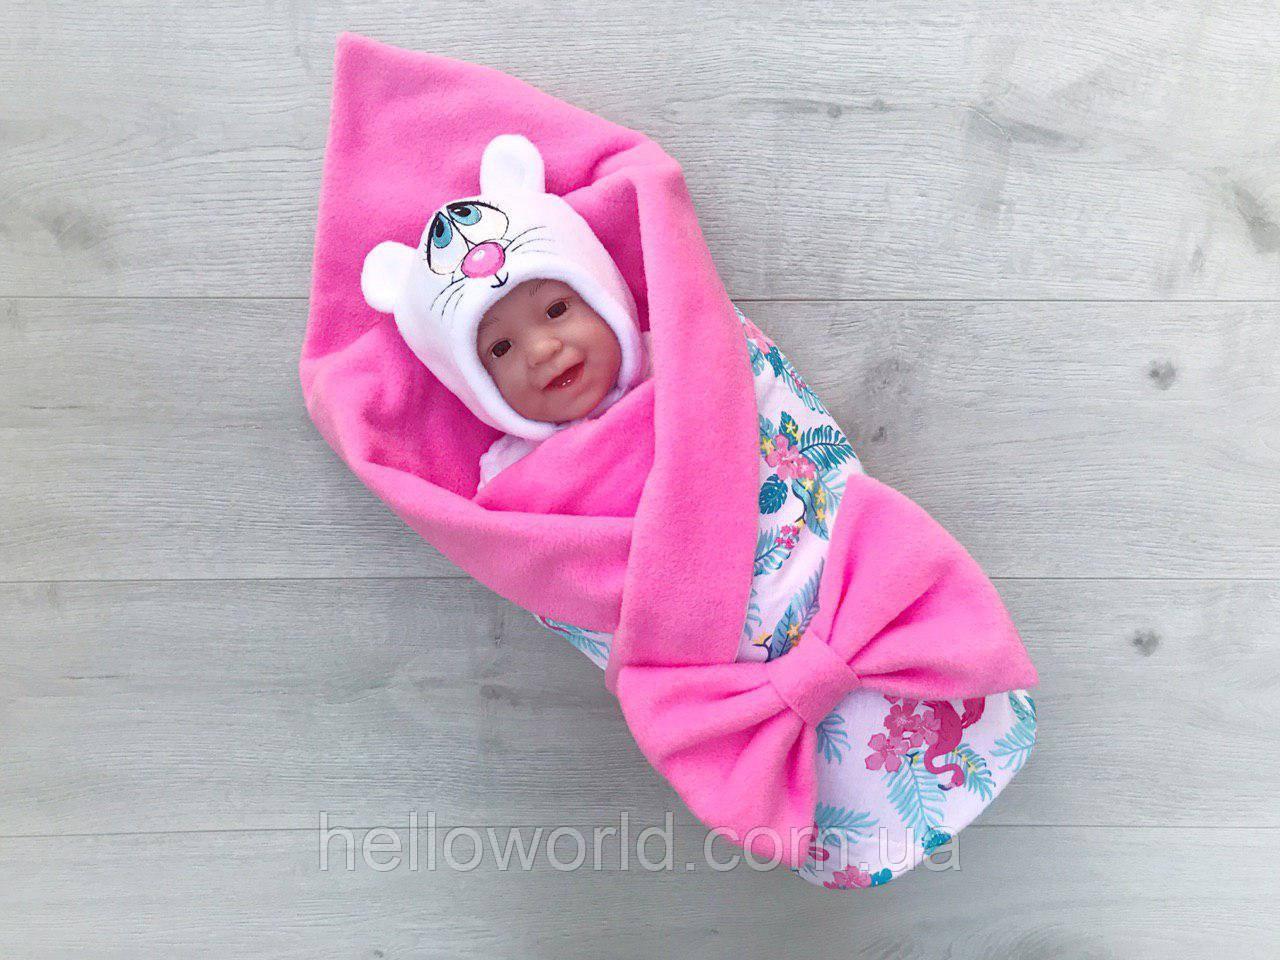 Плед-одеялка розовый фламинго